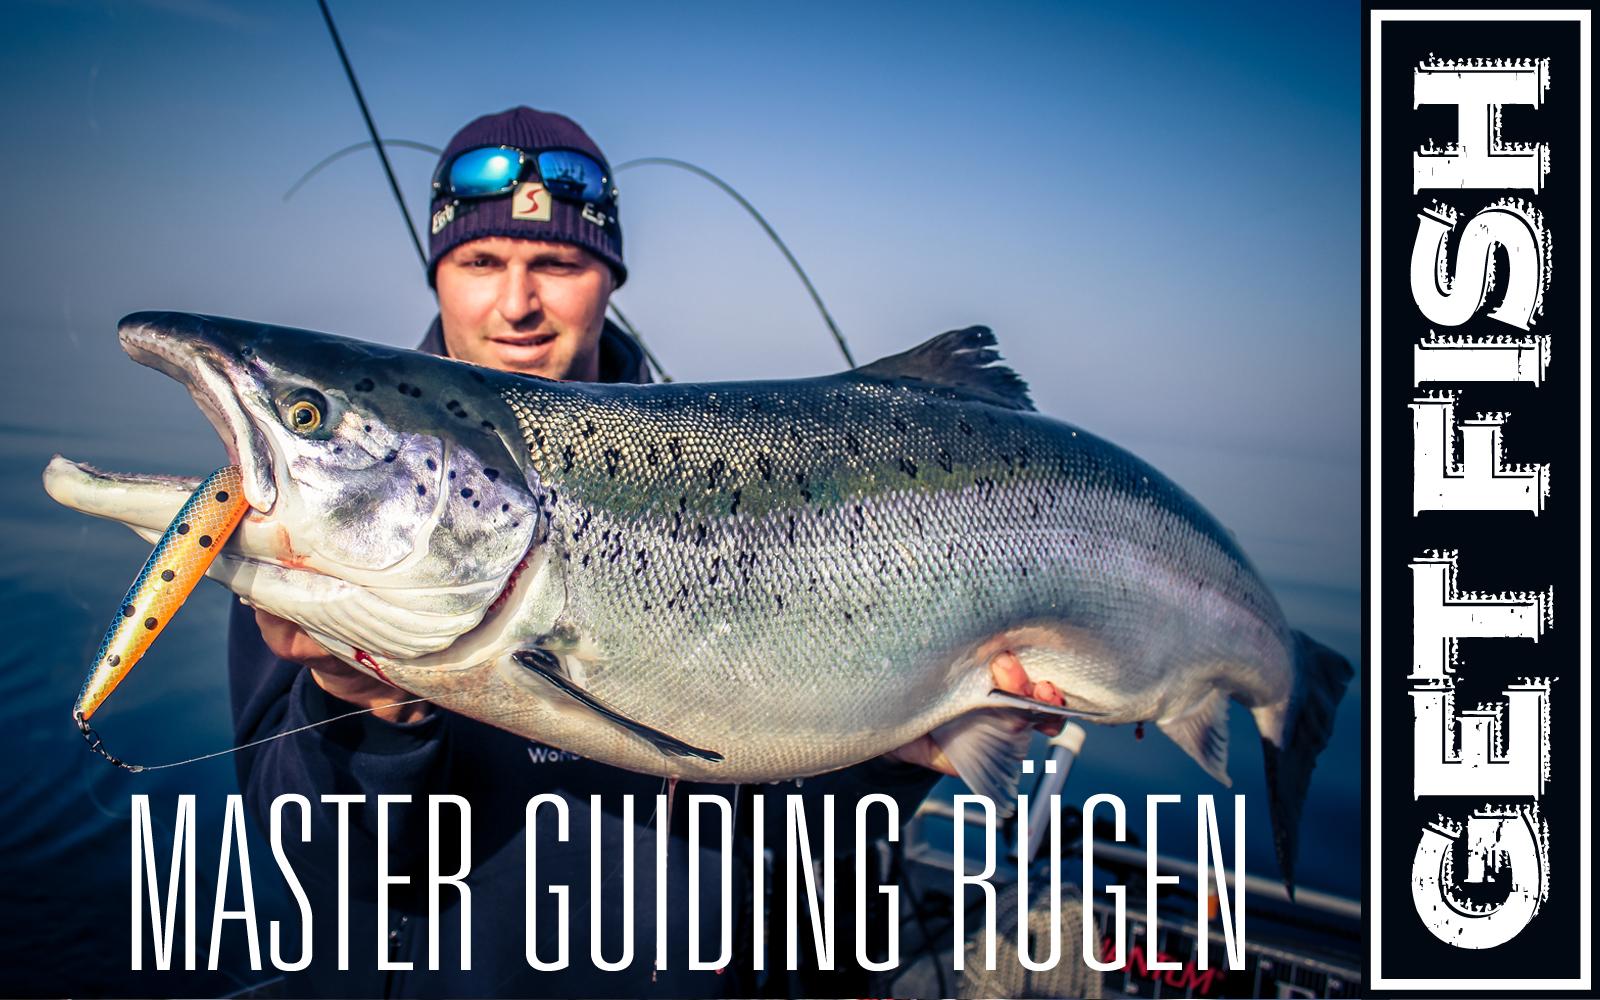 Fiskado - Fiskado Opener Slider 2 - Master Guiding Rügen - fische, angelguiding